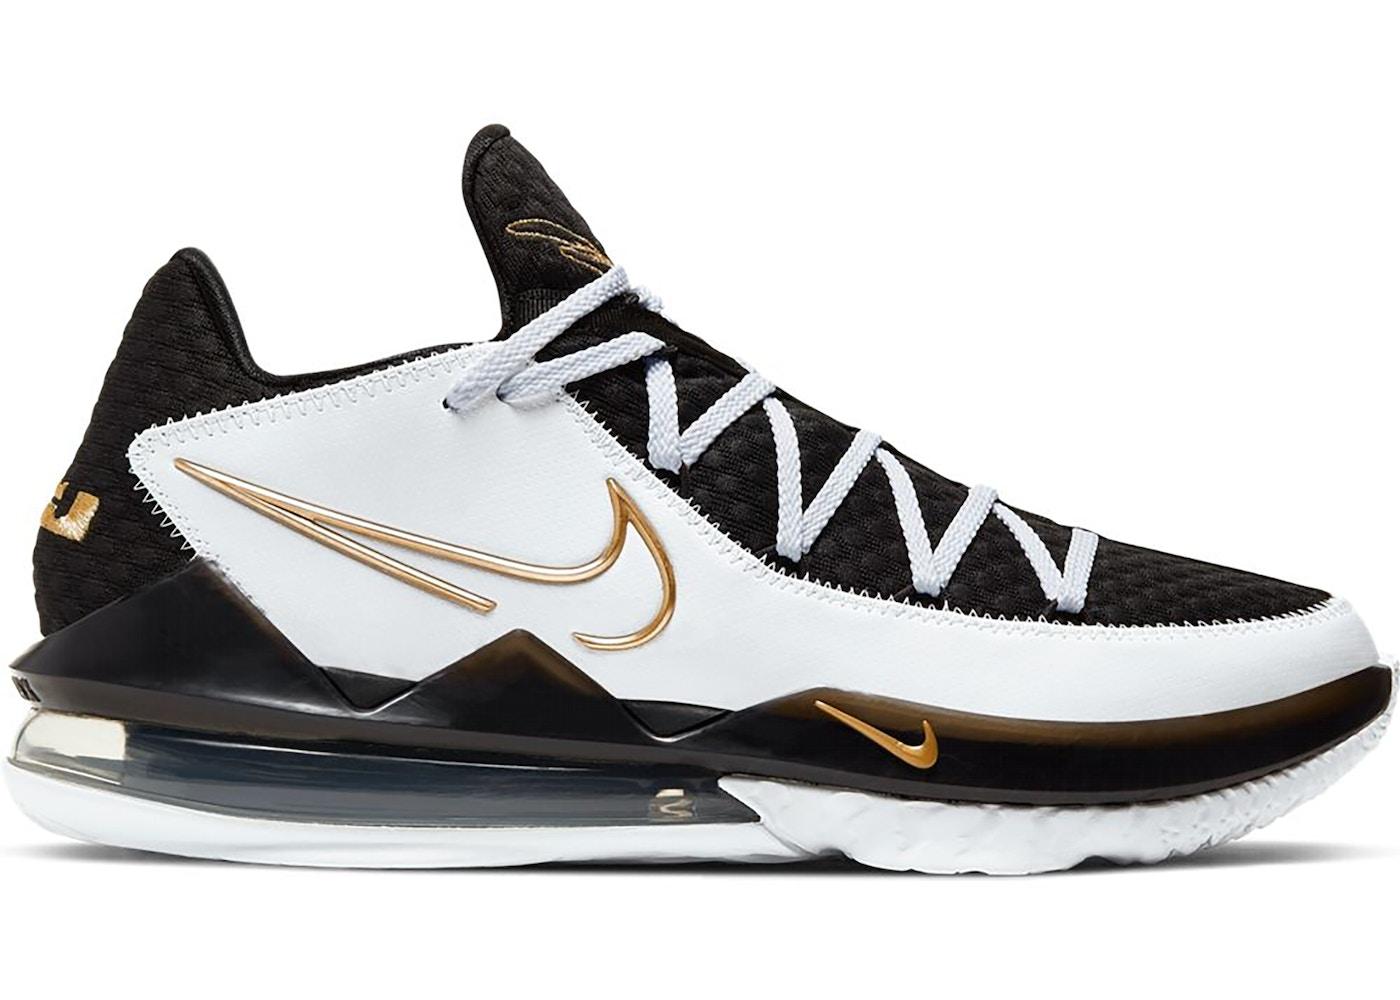 Nike LeBron 17 Low White Metallic Gold